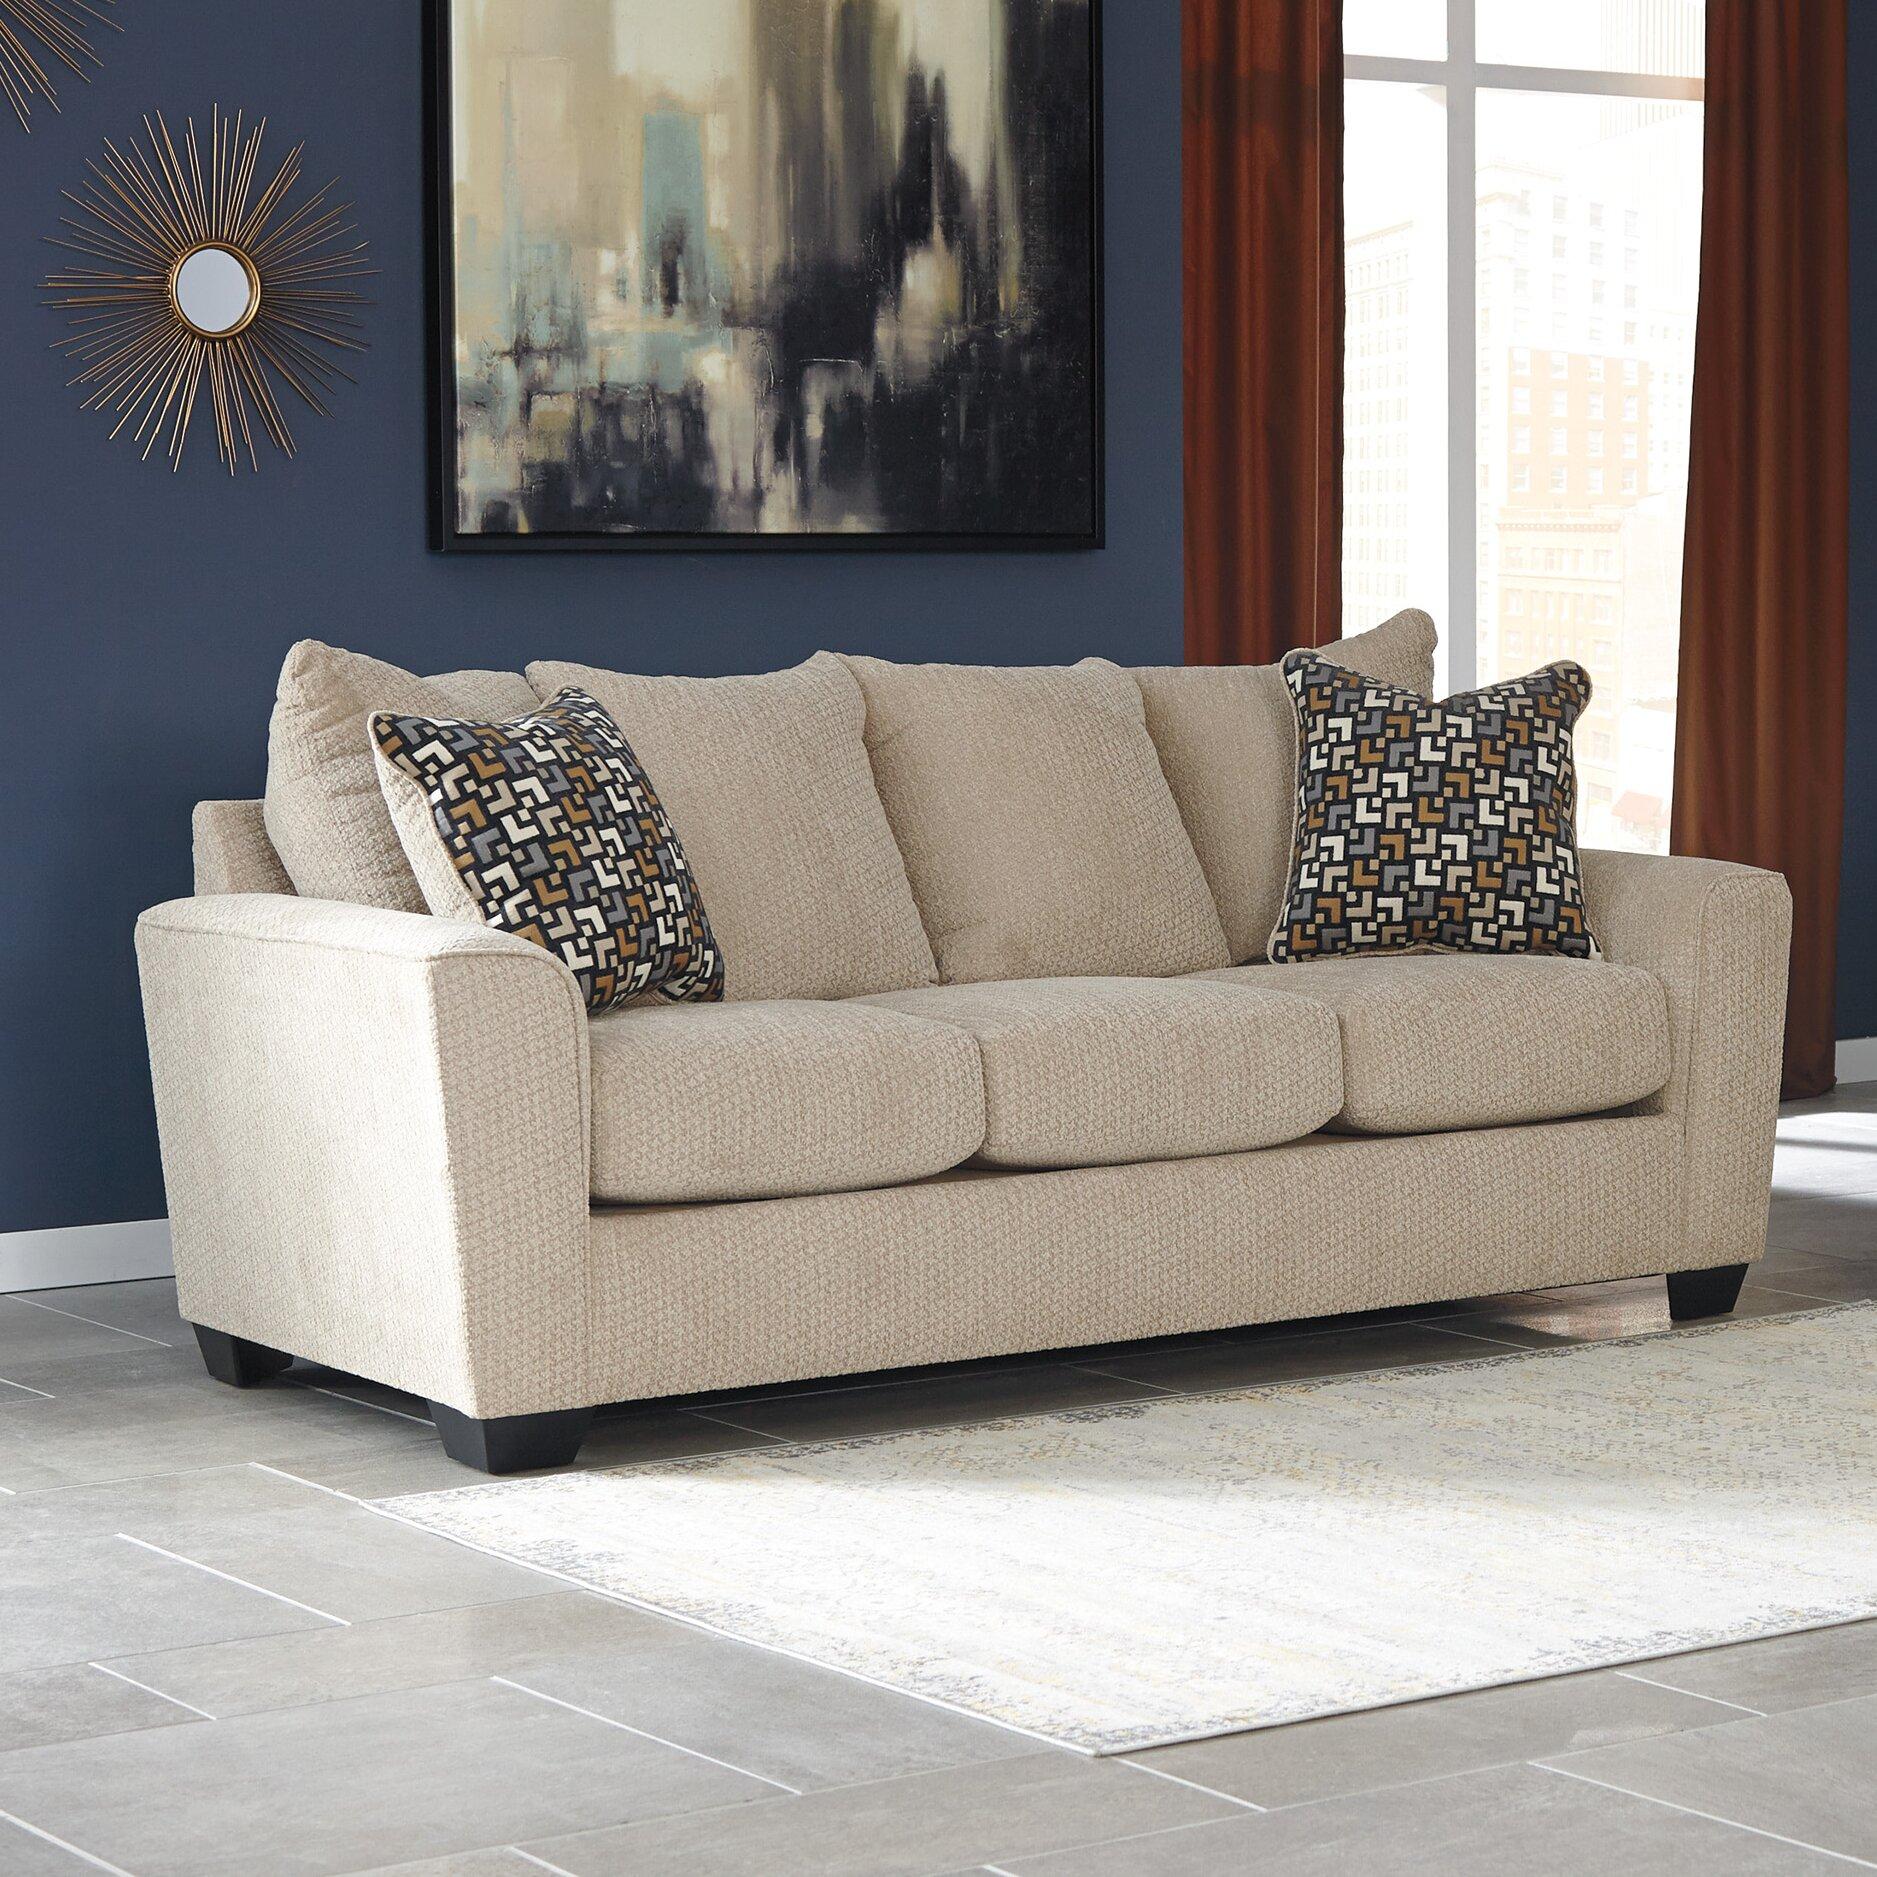 Outstanding Wixon Sleeper Sofa Benchcraft Wixon Sleeper Sofa Wayfair Machost Co Dining Chair Design Ideas Machostcouk